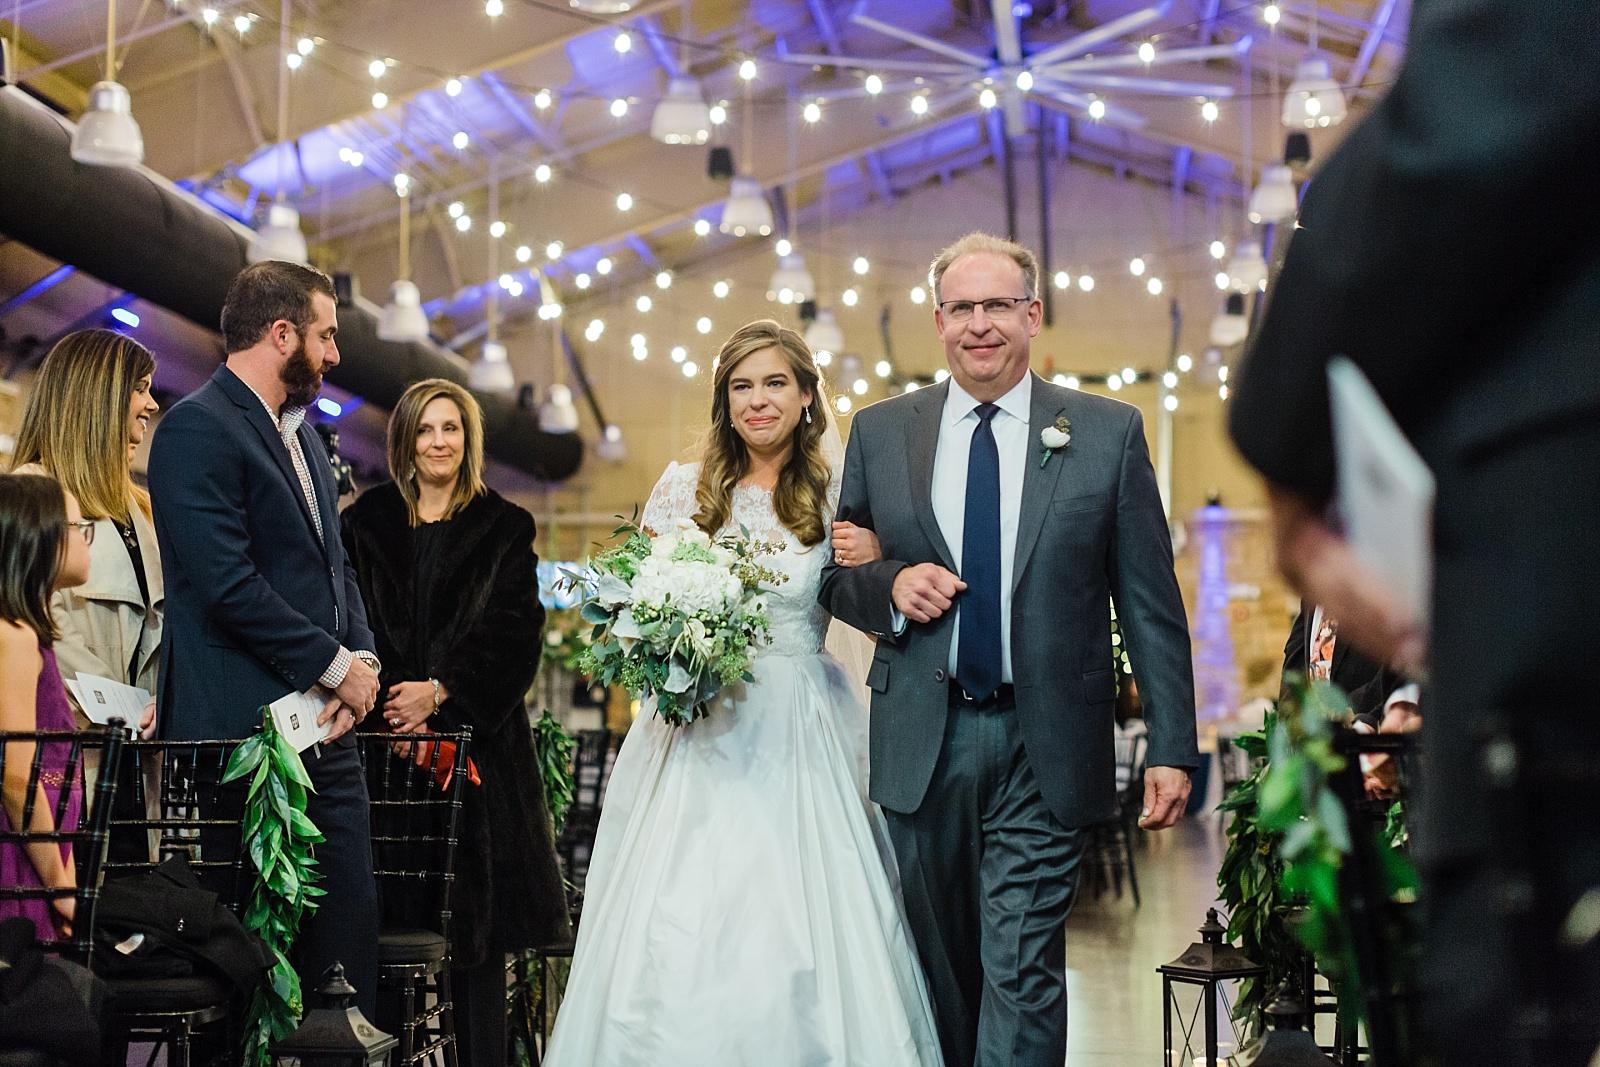 Winter Wedding At The Tuscaloosa River Market